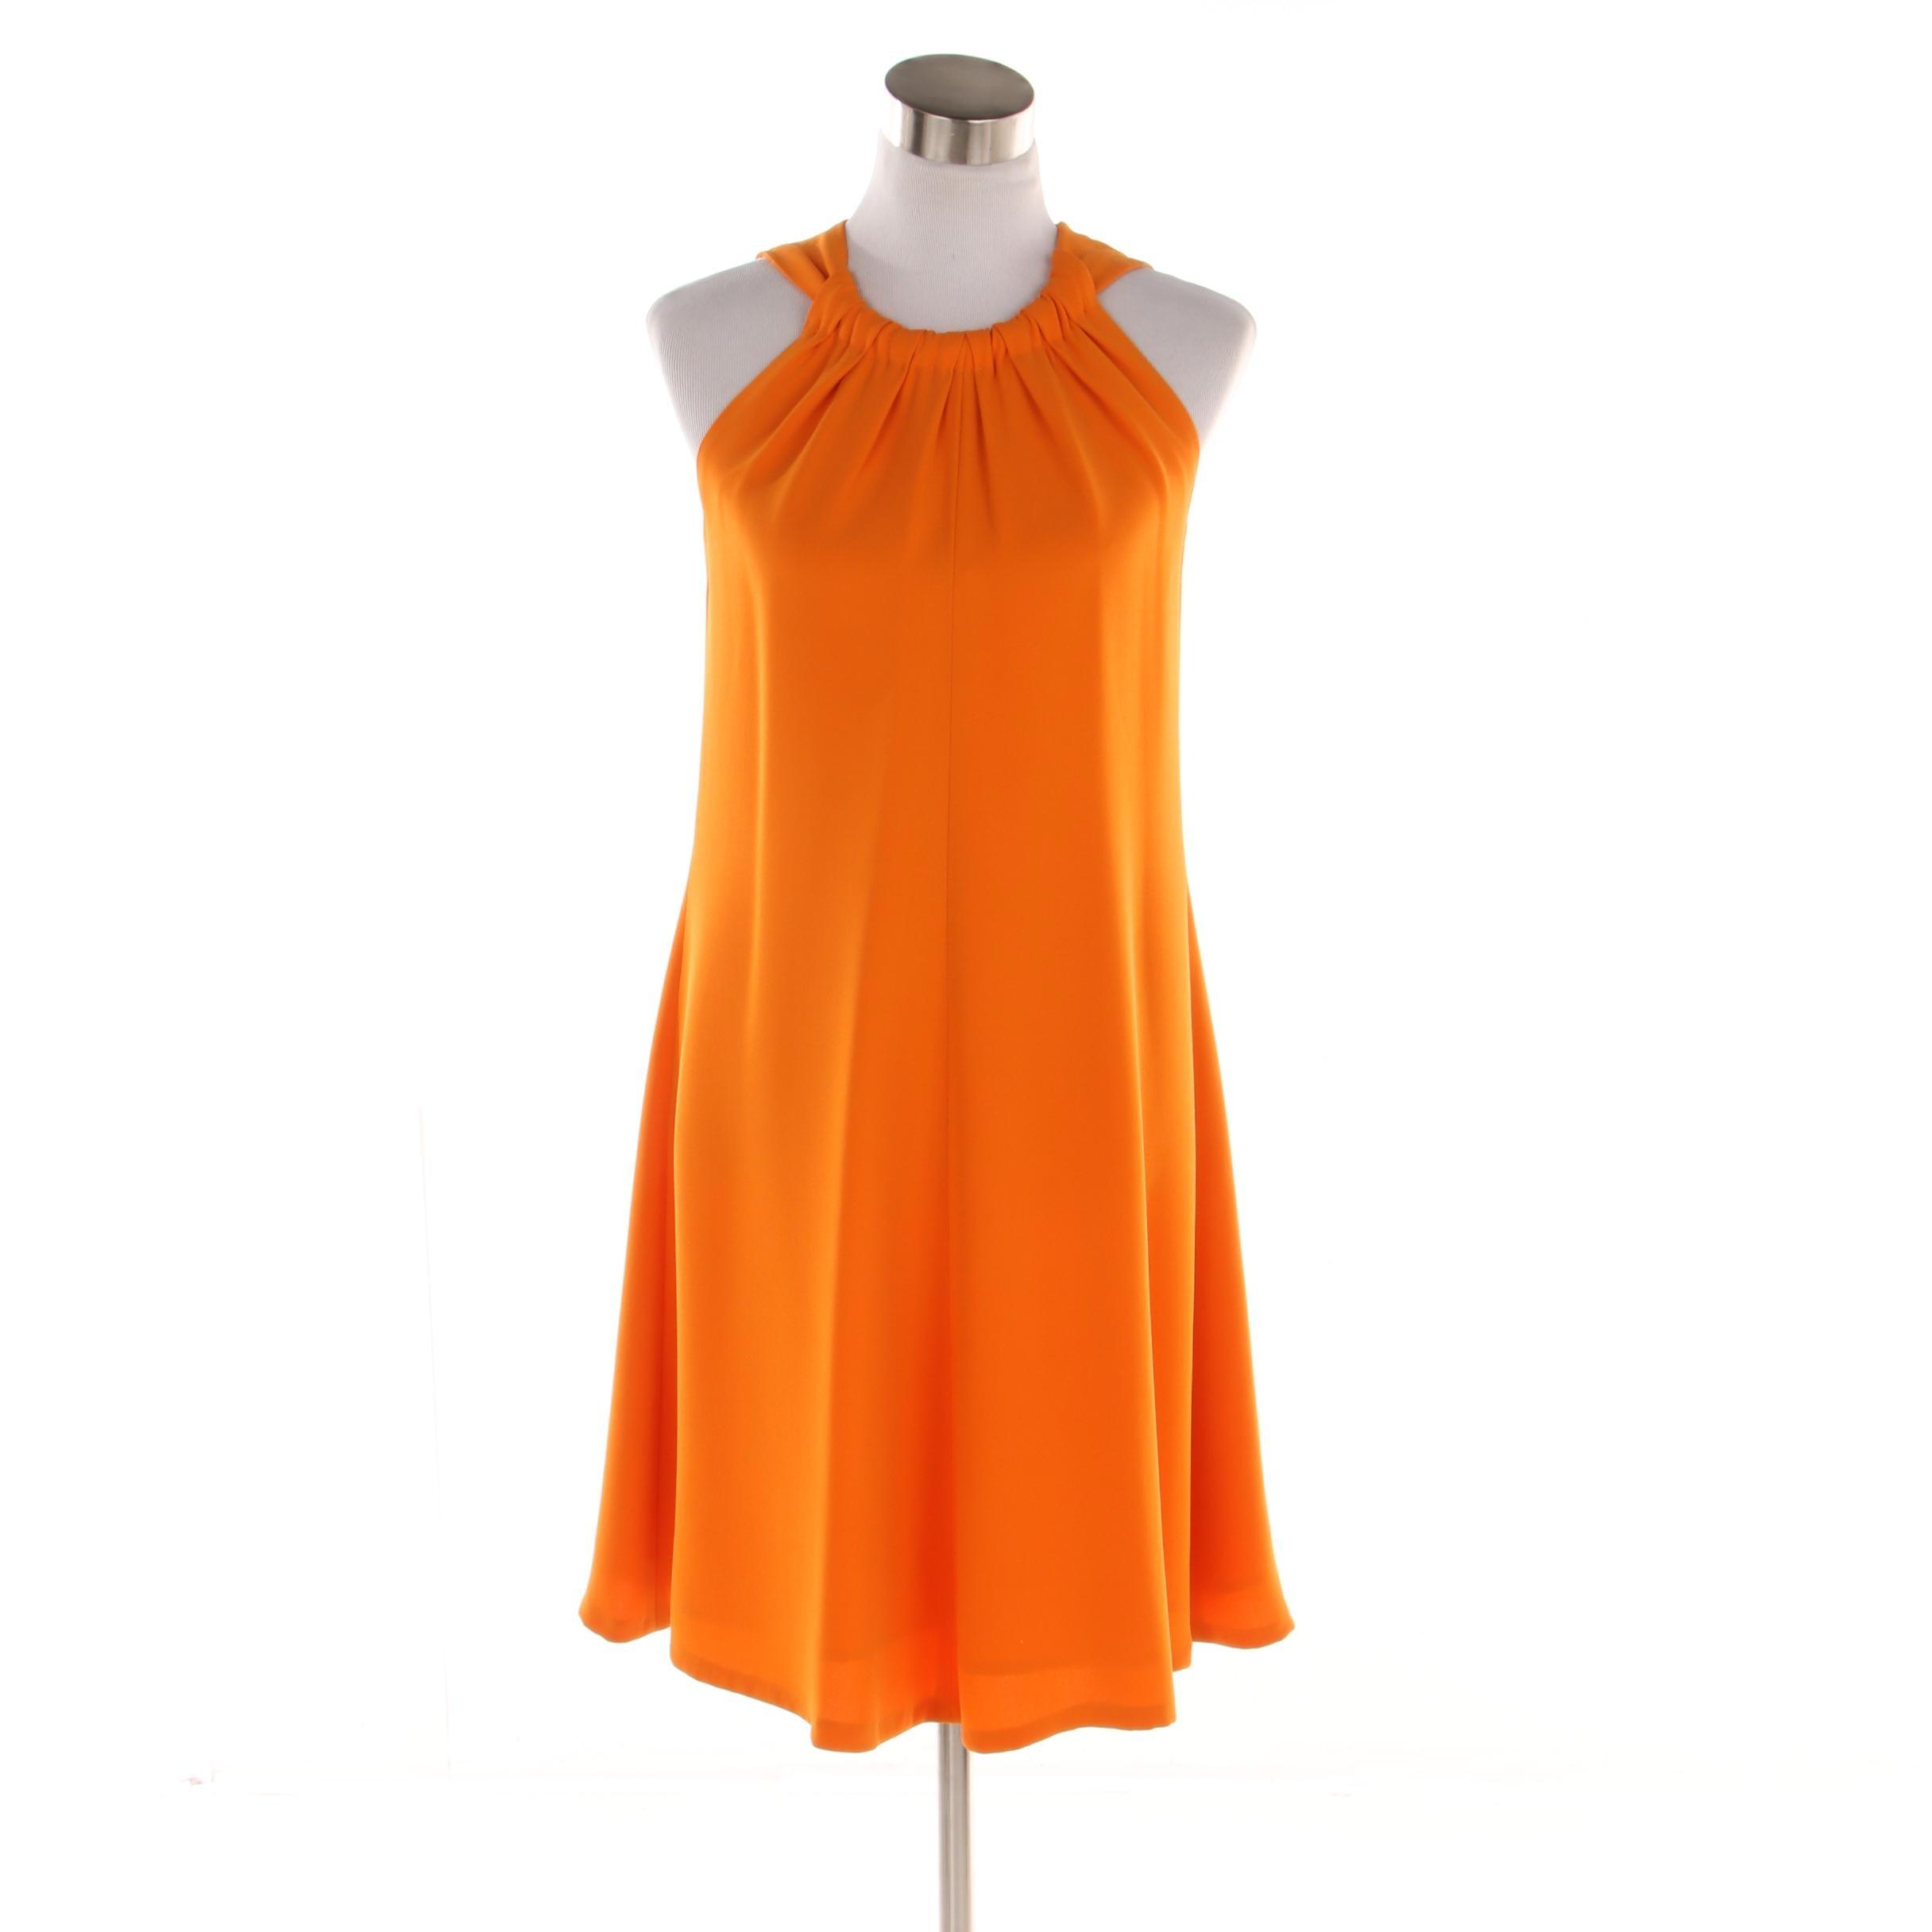 Women's Oscar de la Renta Tangerine Silk Trapeze Cocktail Dress